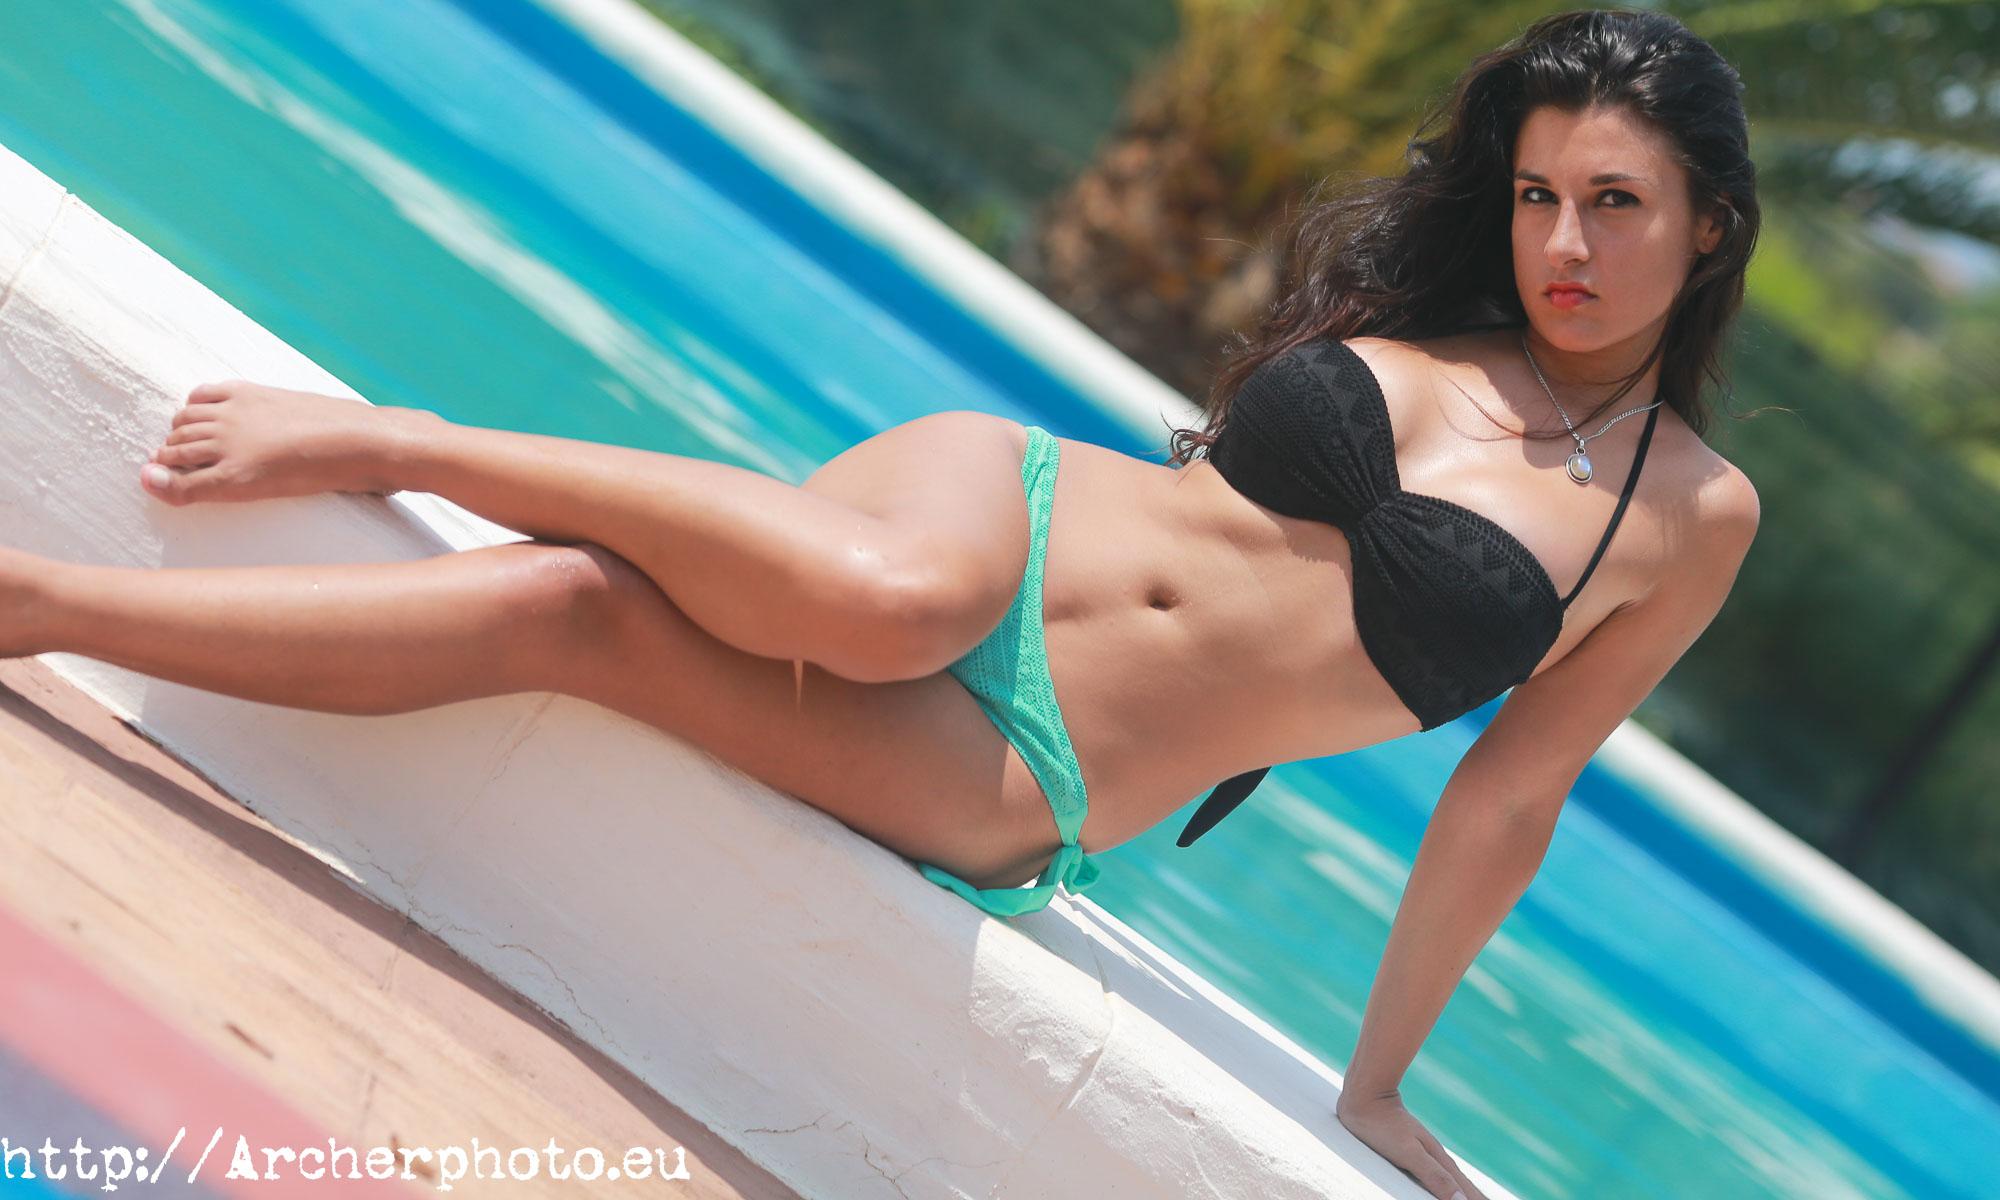 Jéssica en la piscina, Sergi Albir, Fotografía profesional